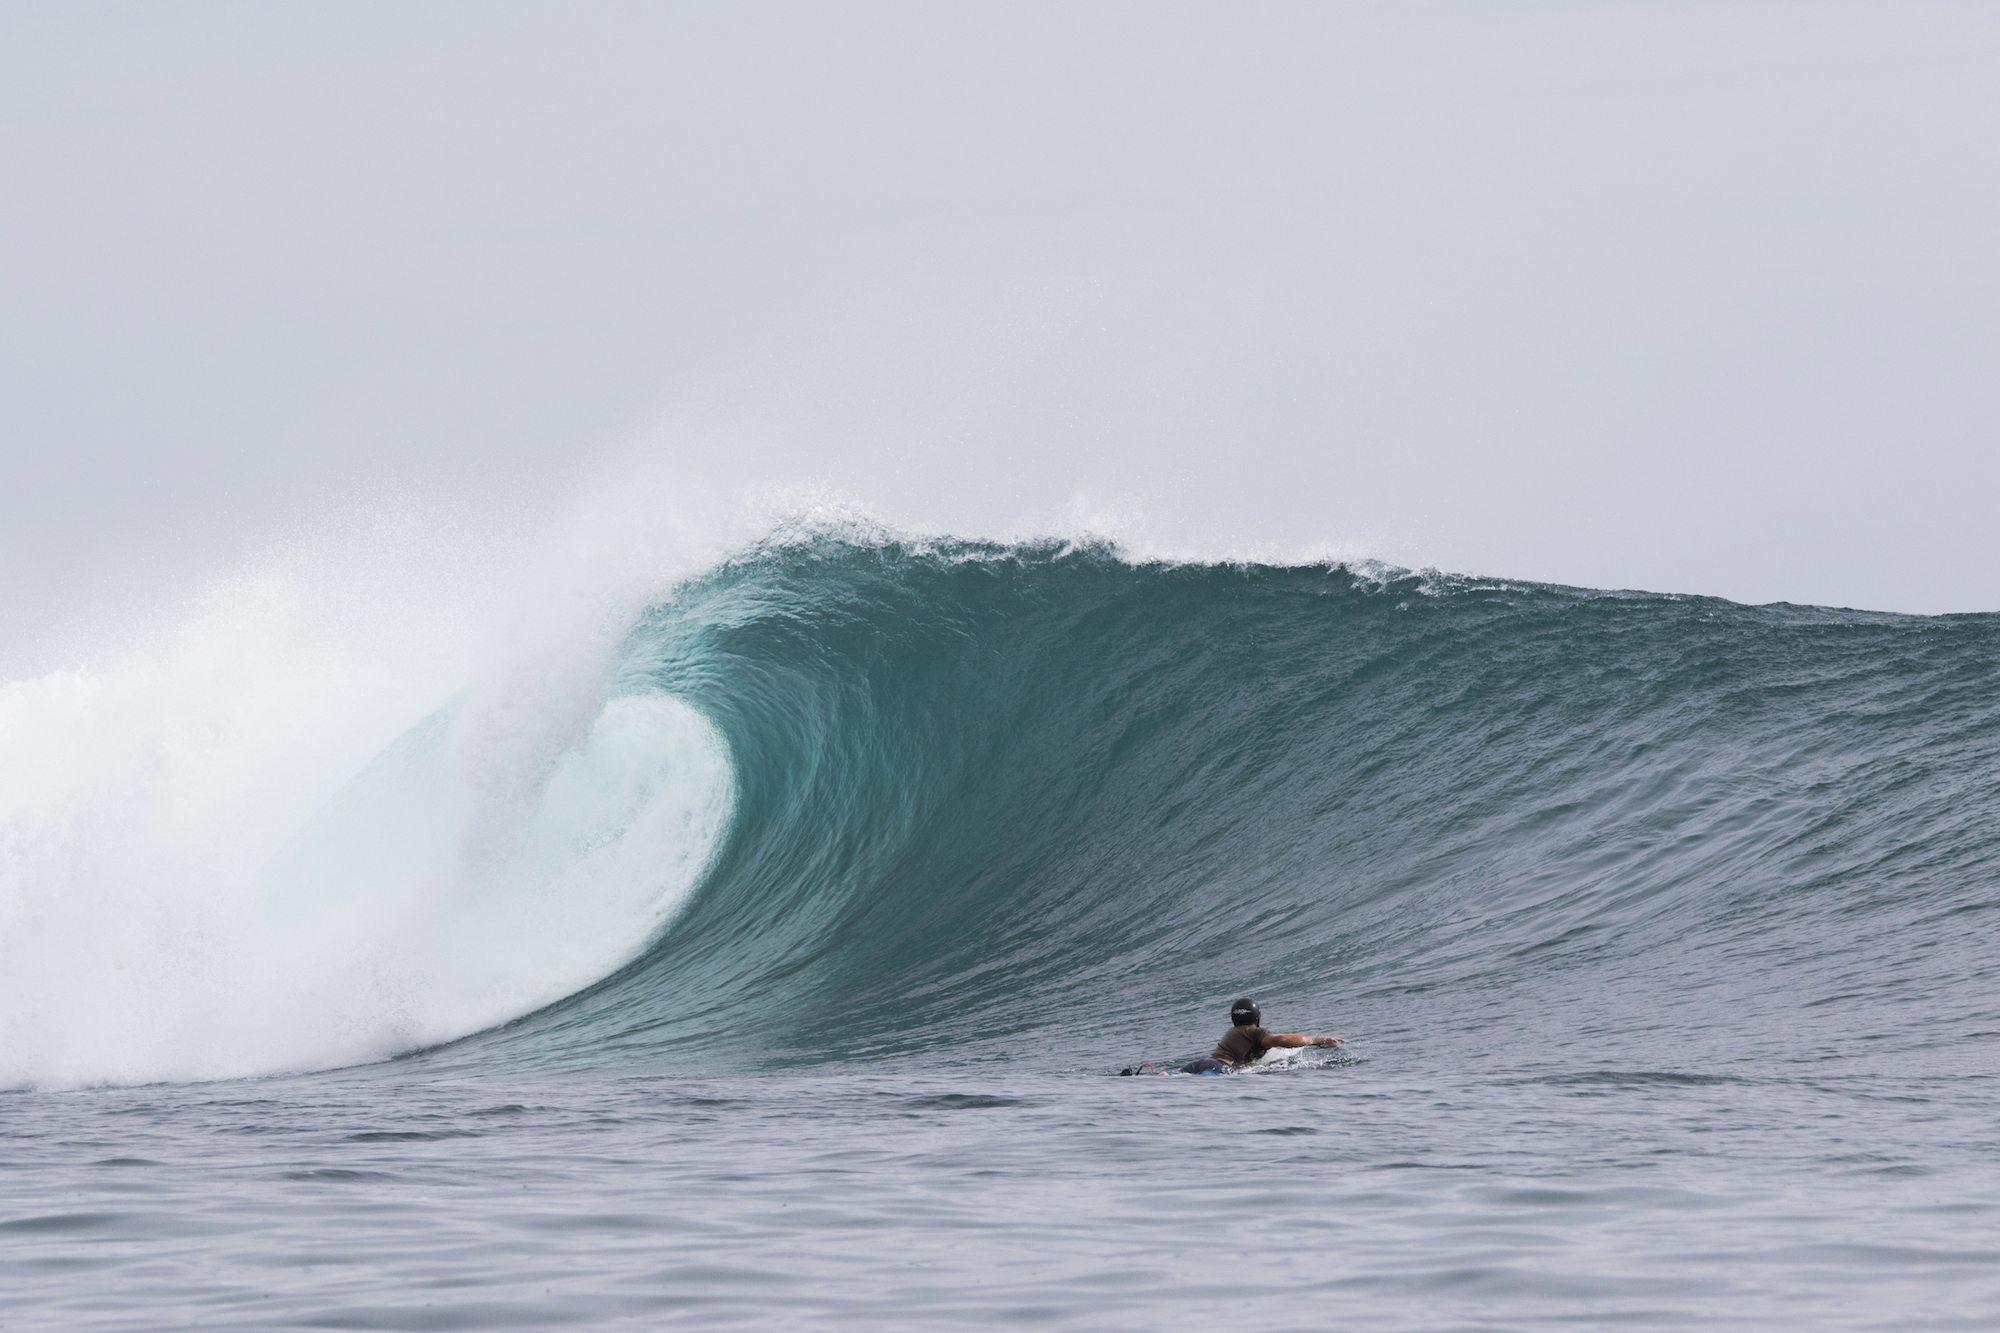 Clarets / Lolok Point / Bay of Plenty Lefts 3